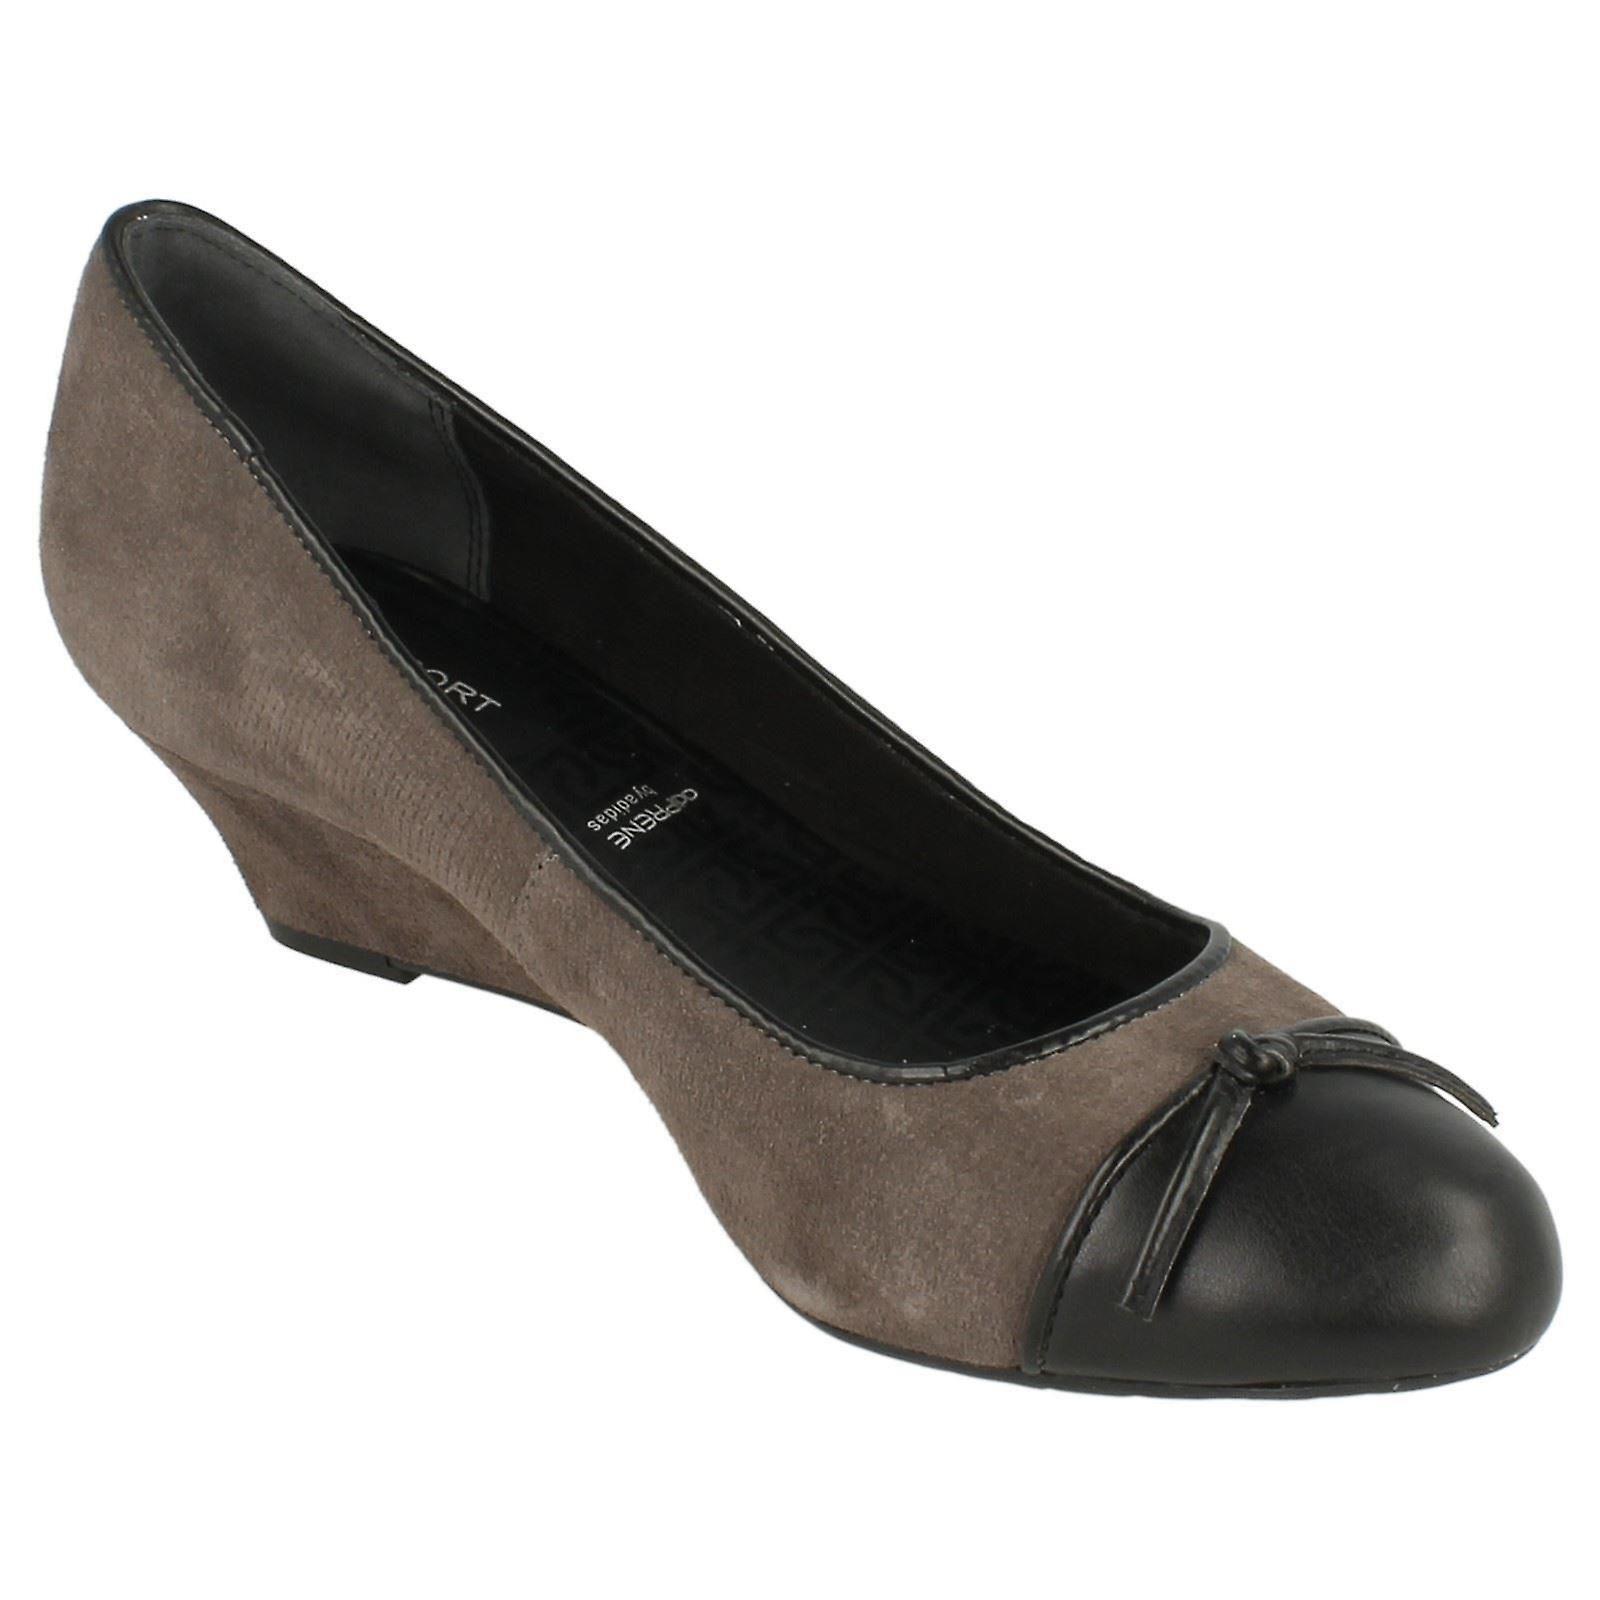 Dame Rockport Smart Casual kilet Ballerina - størrelse 4